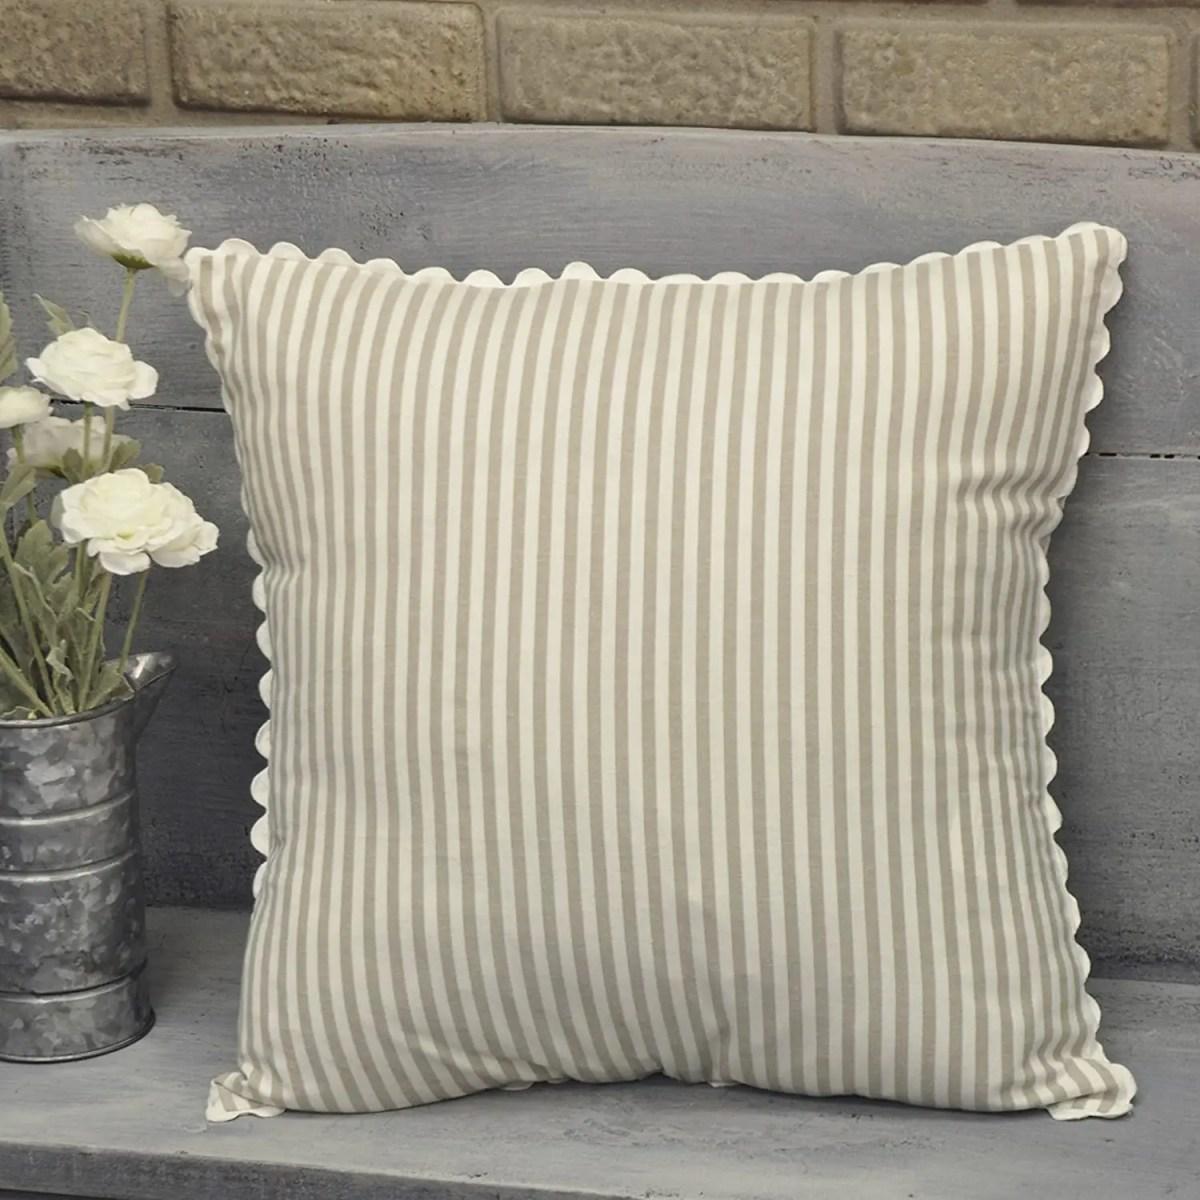 Ticking-Stripe-Taupe-Pillowcase